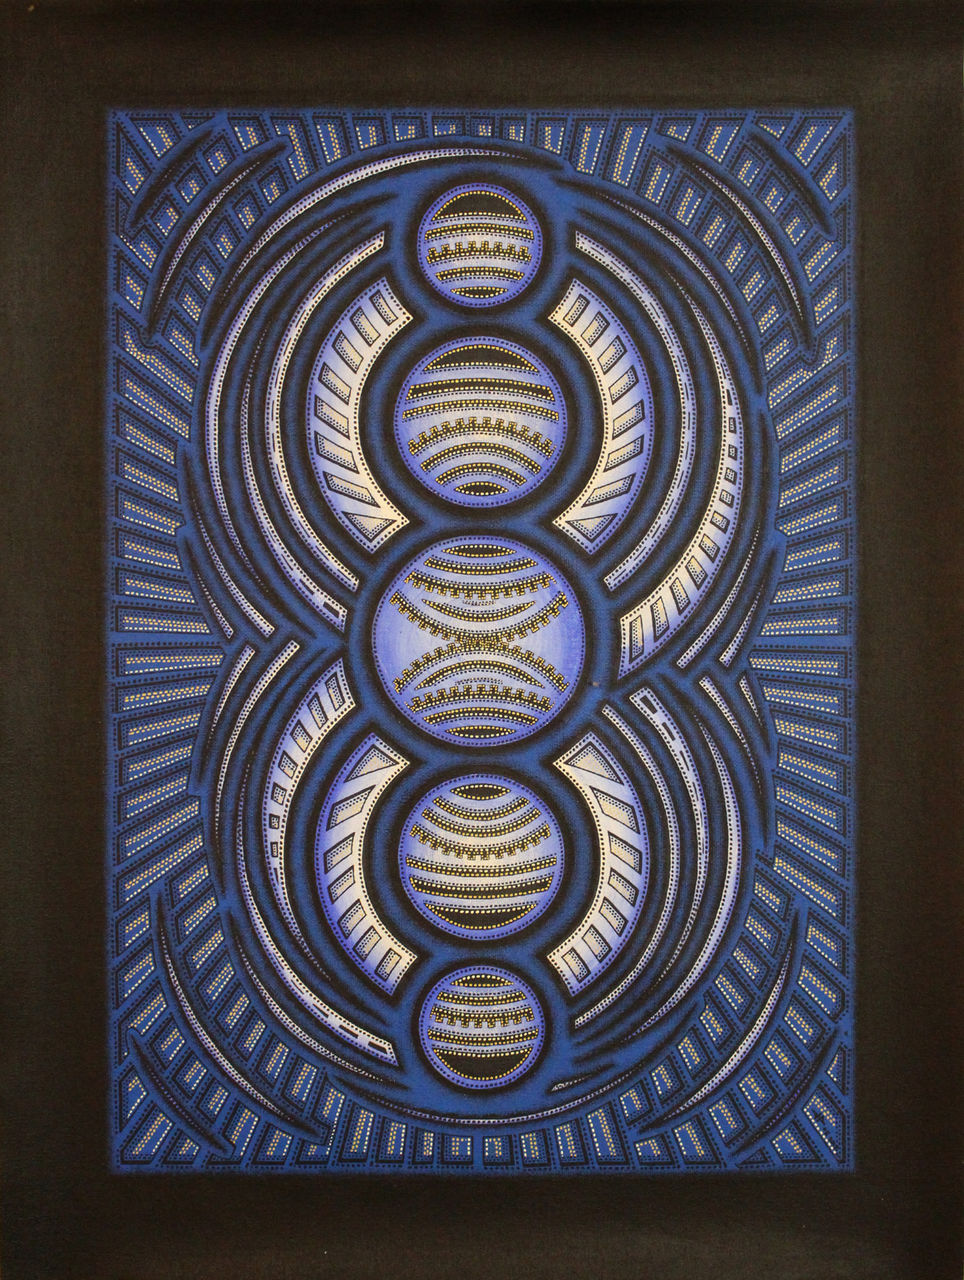 Jonathan-Pradillon Cycle bleu